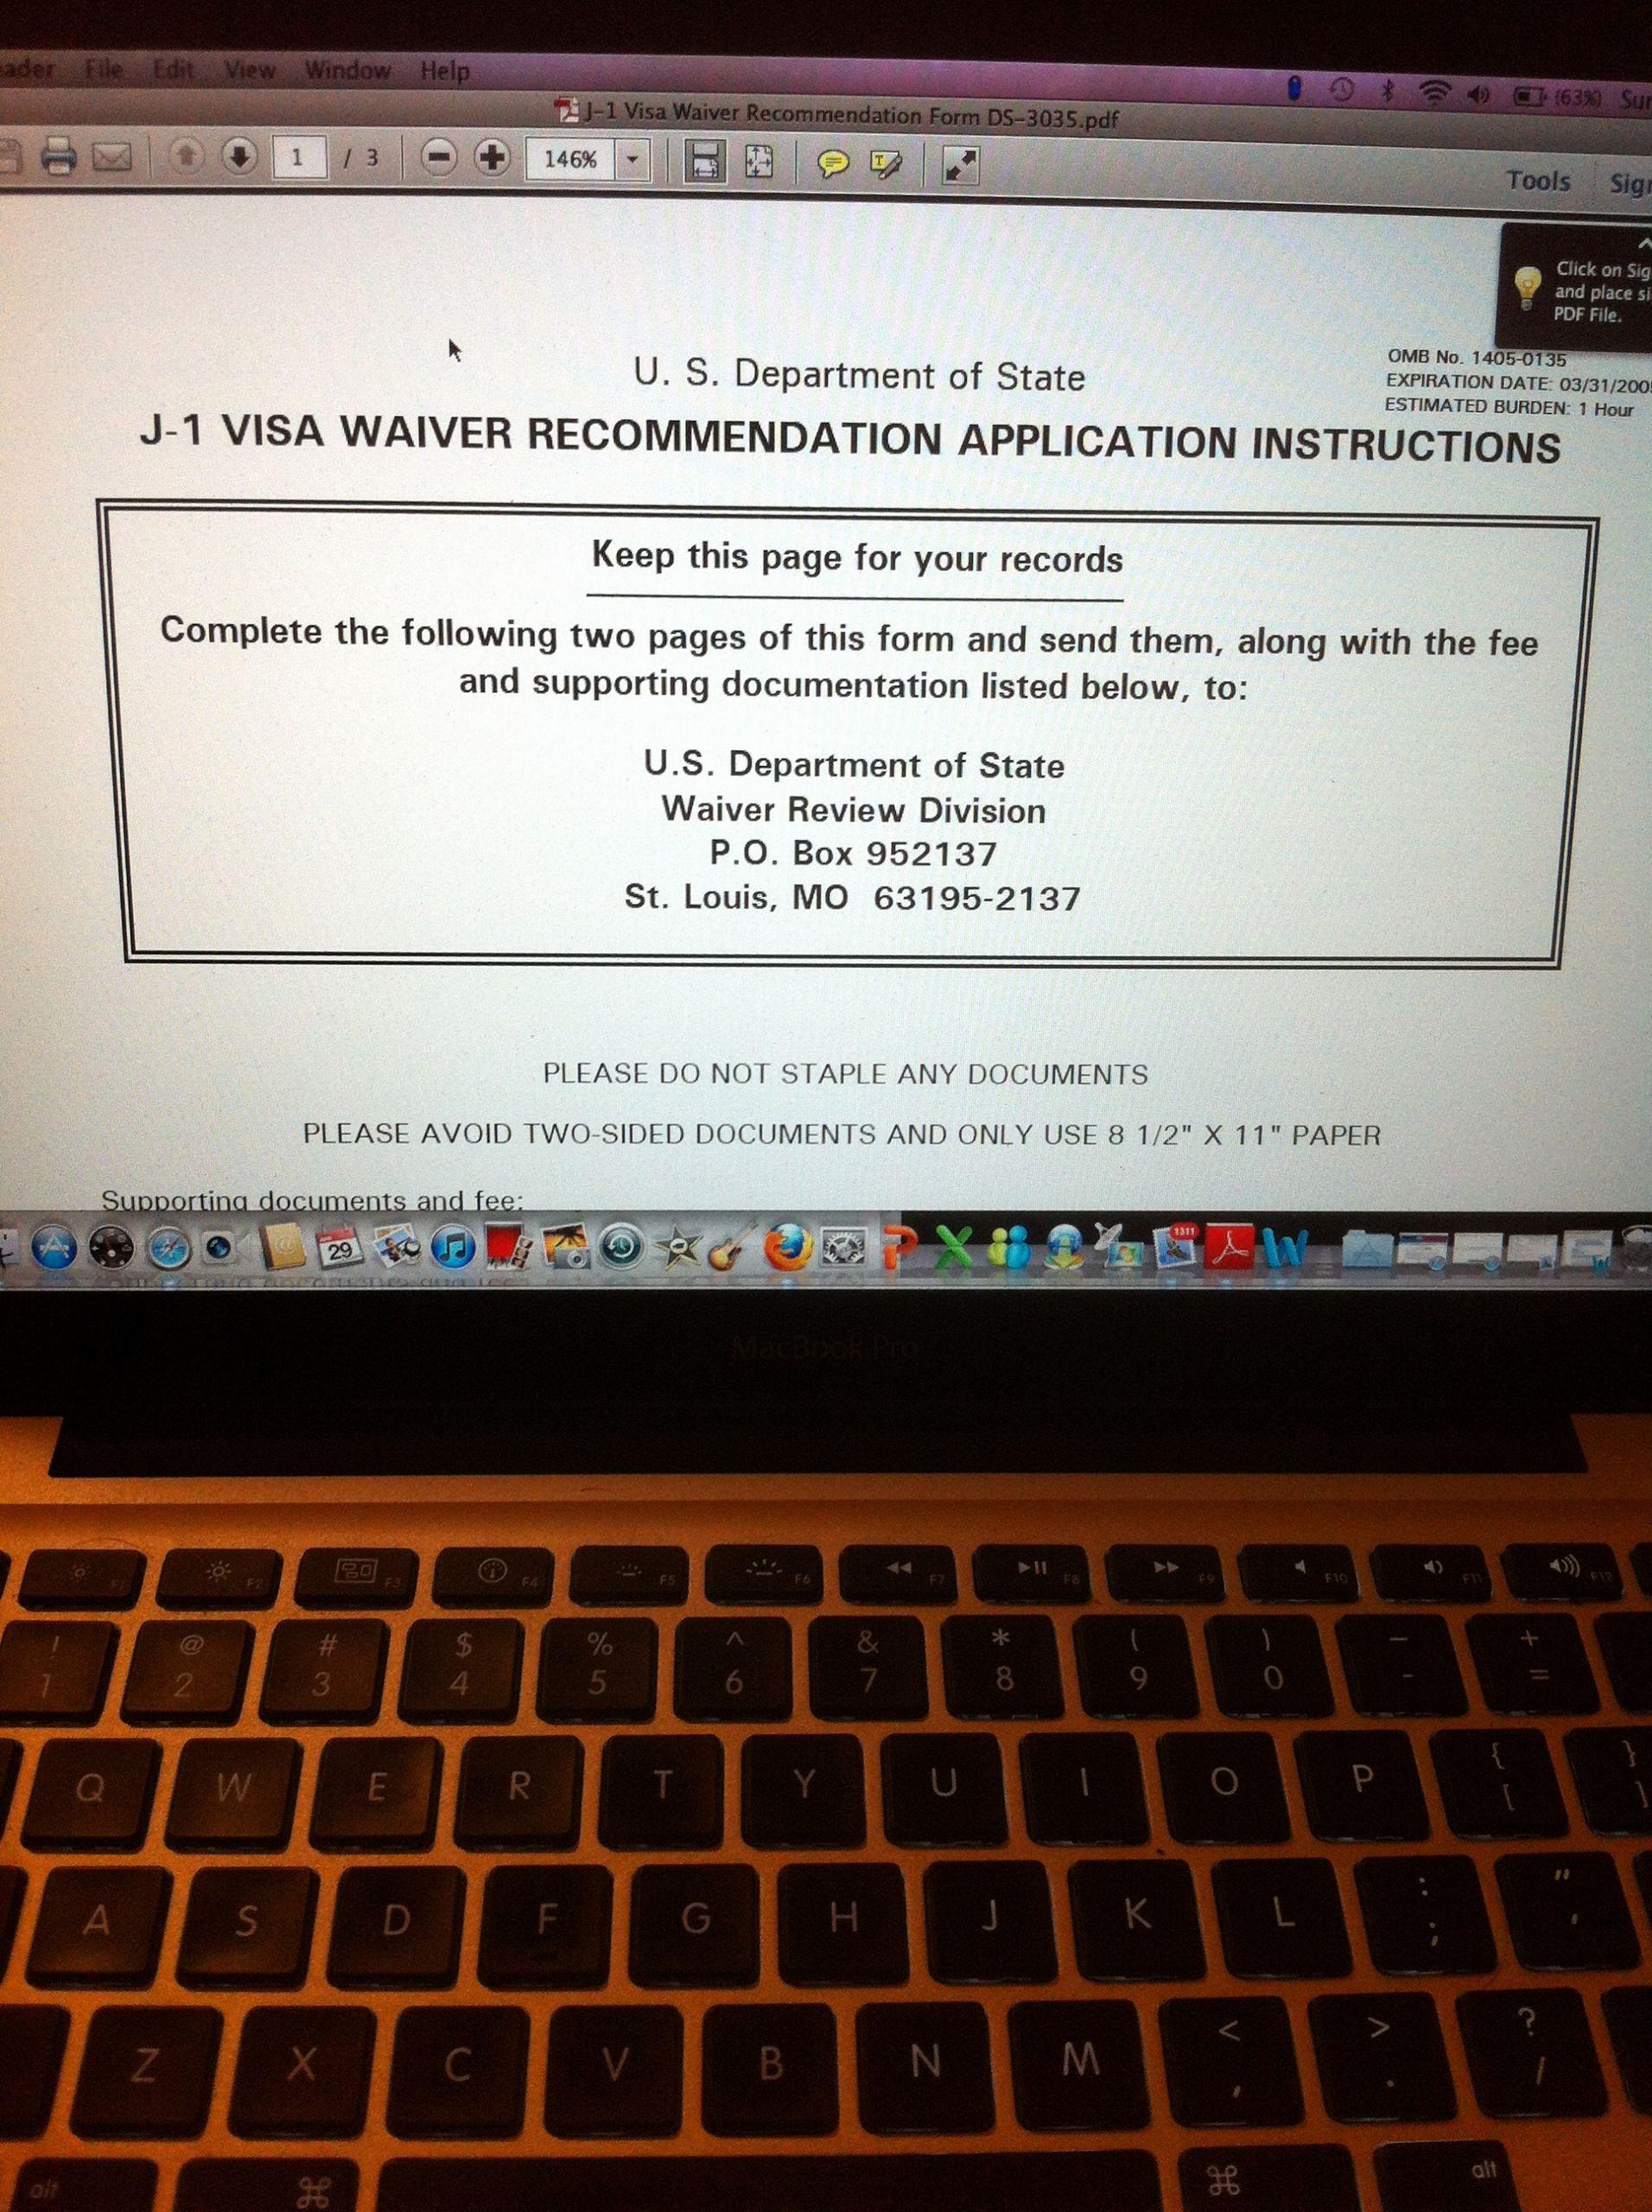 U Visa Personal Statement Sample Beautiful For J1 Waiver Application Mission